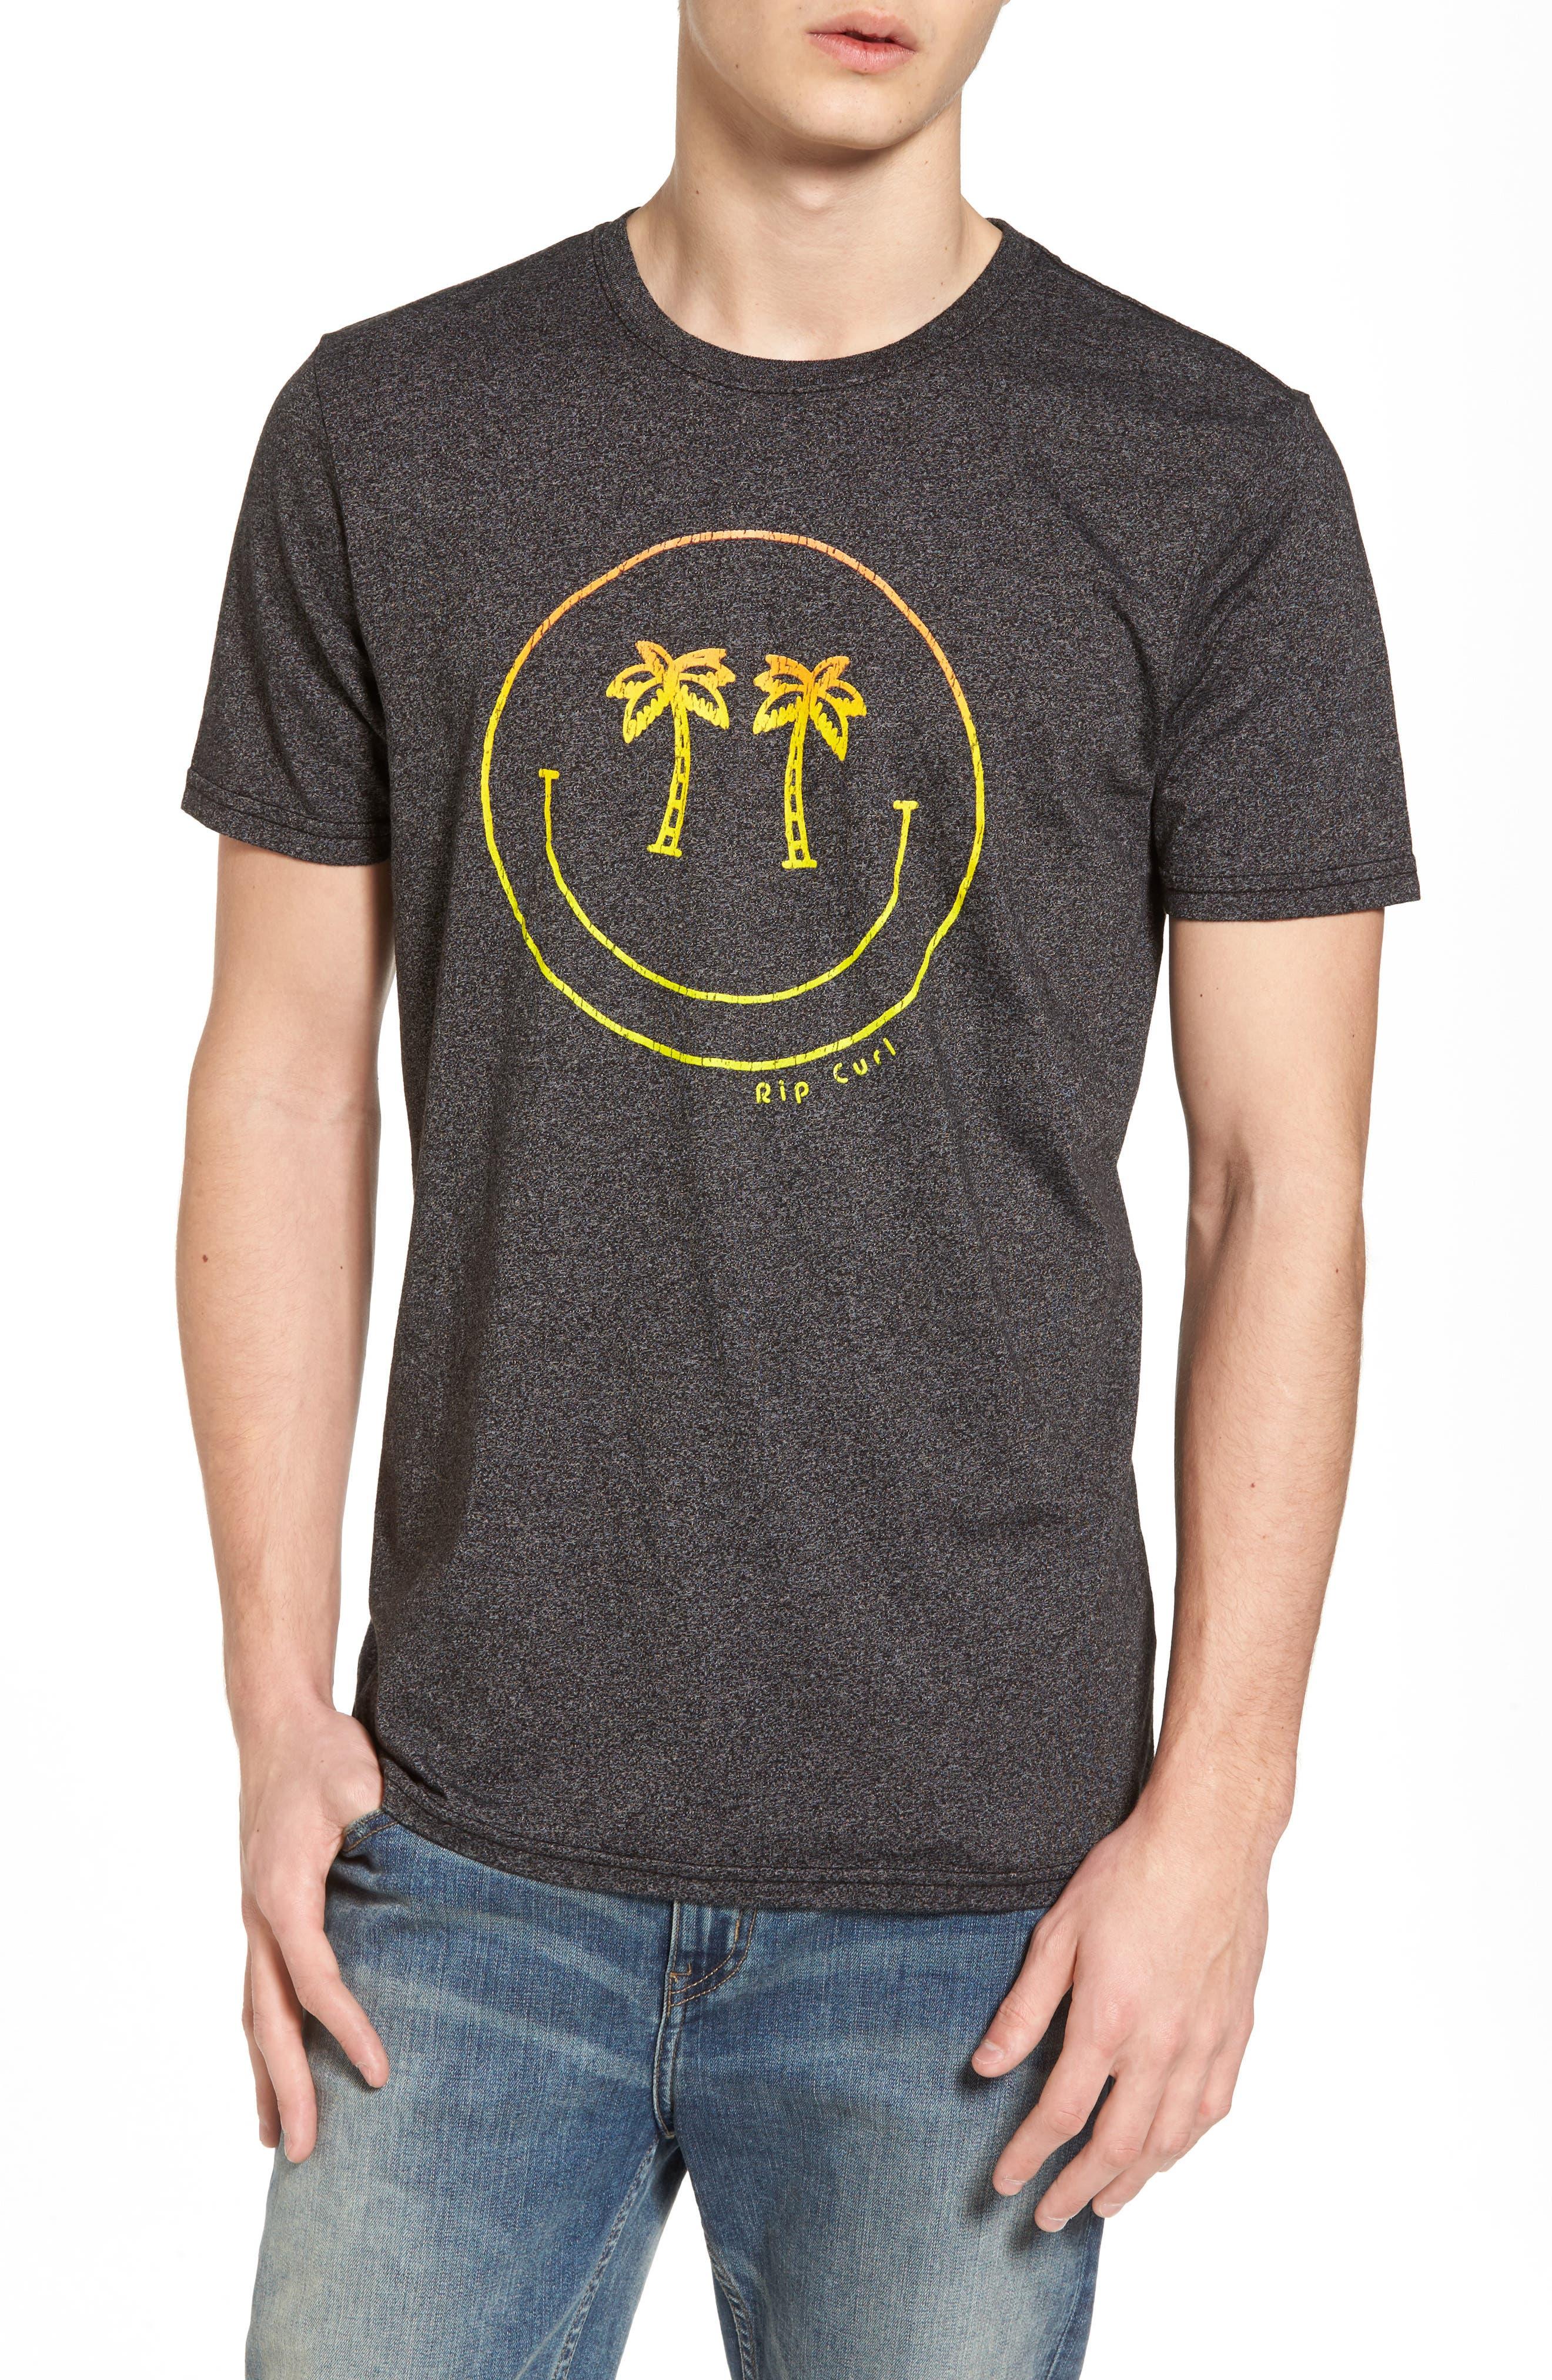 Main Image - Rip Curl Palm Vision Mock Twist T-Shirt